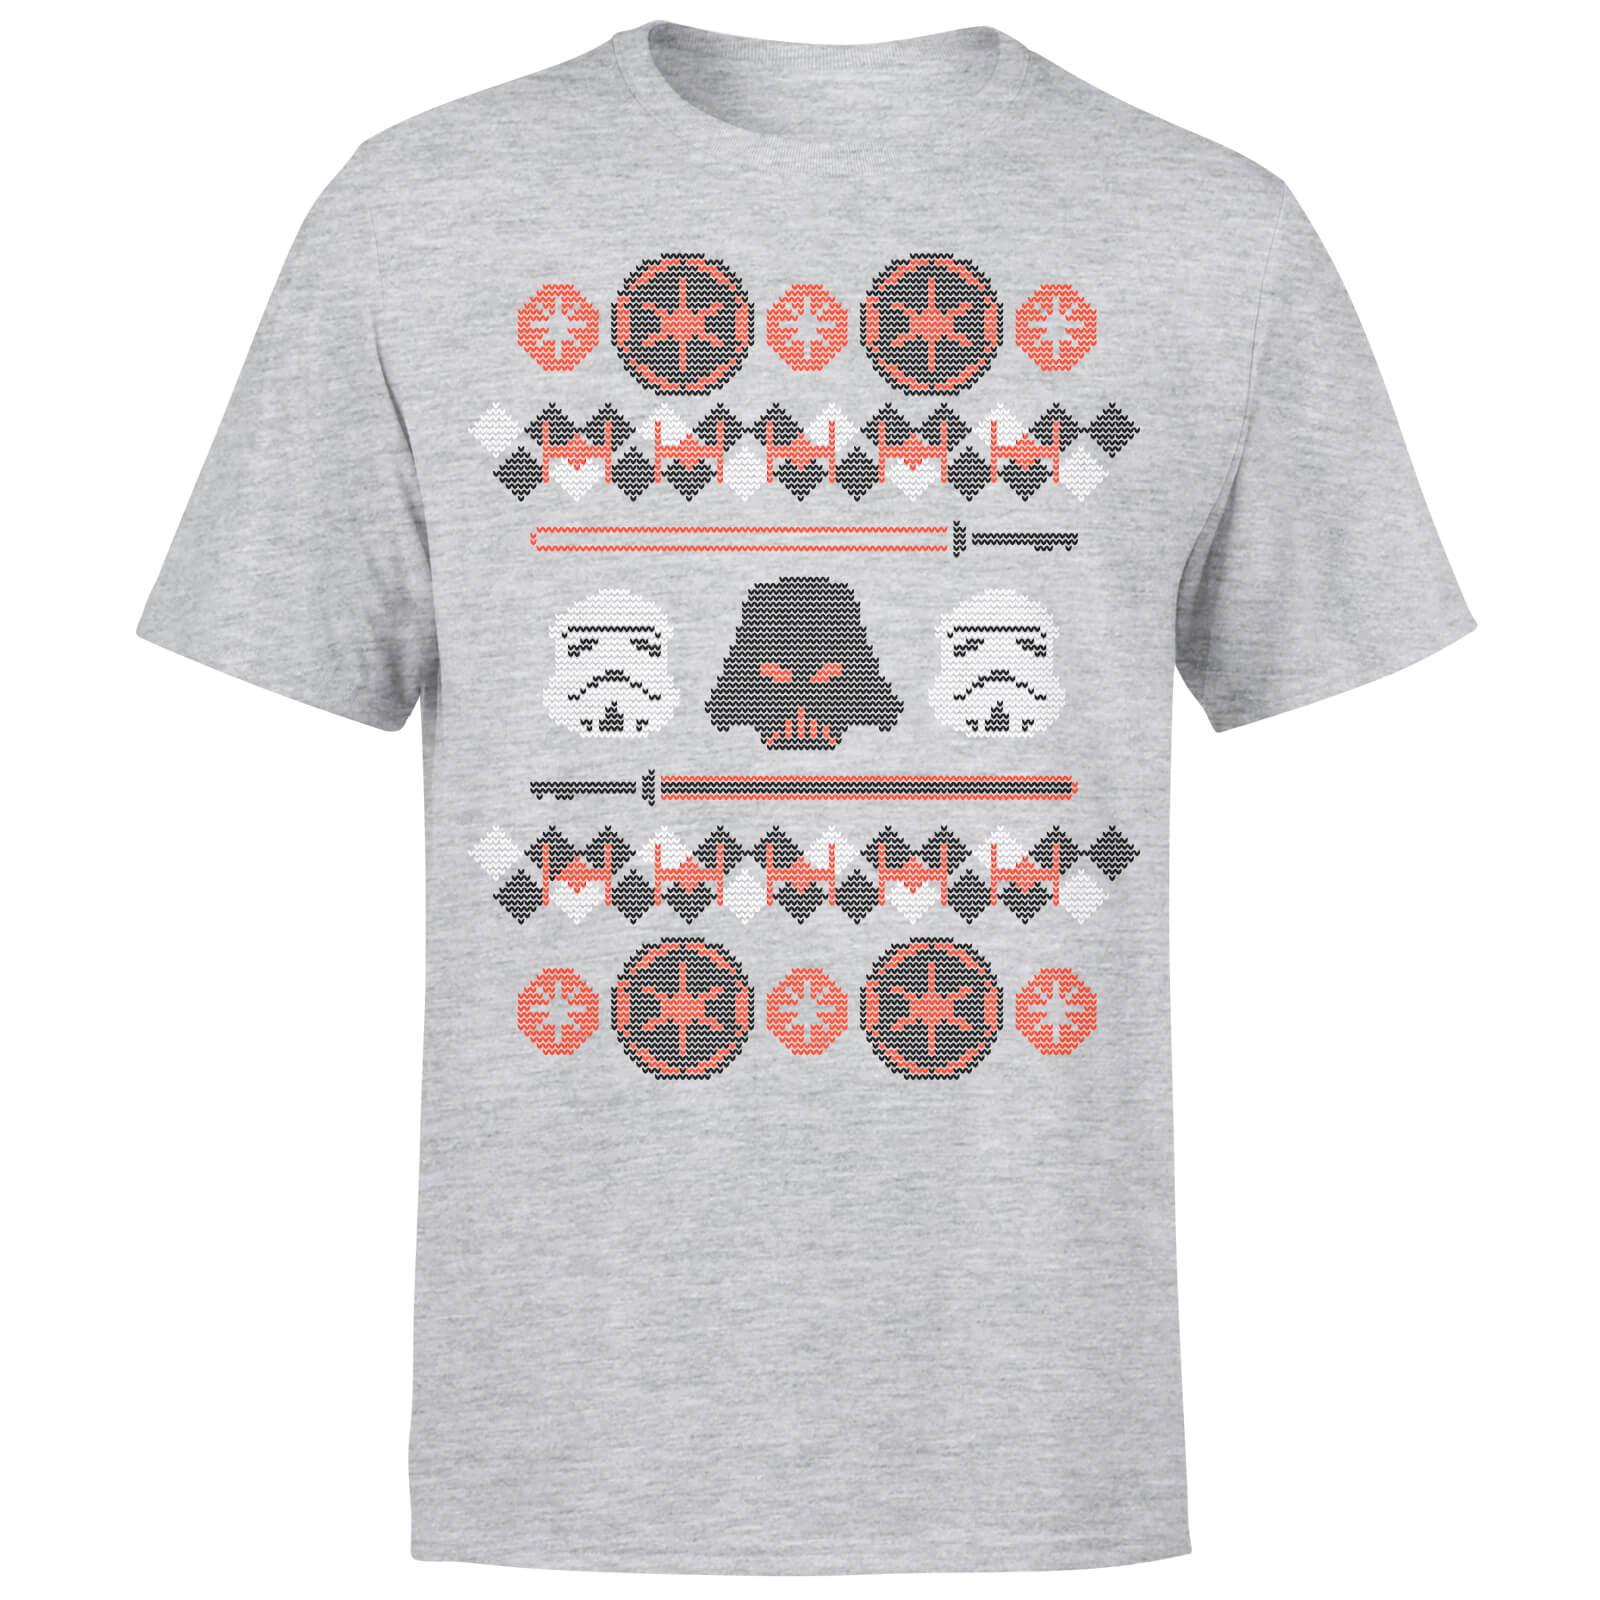 Star Wars T-Shirt Homme Sucre d'Orge Yoda Star Wars - Noir - L - Gris